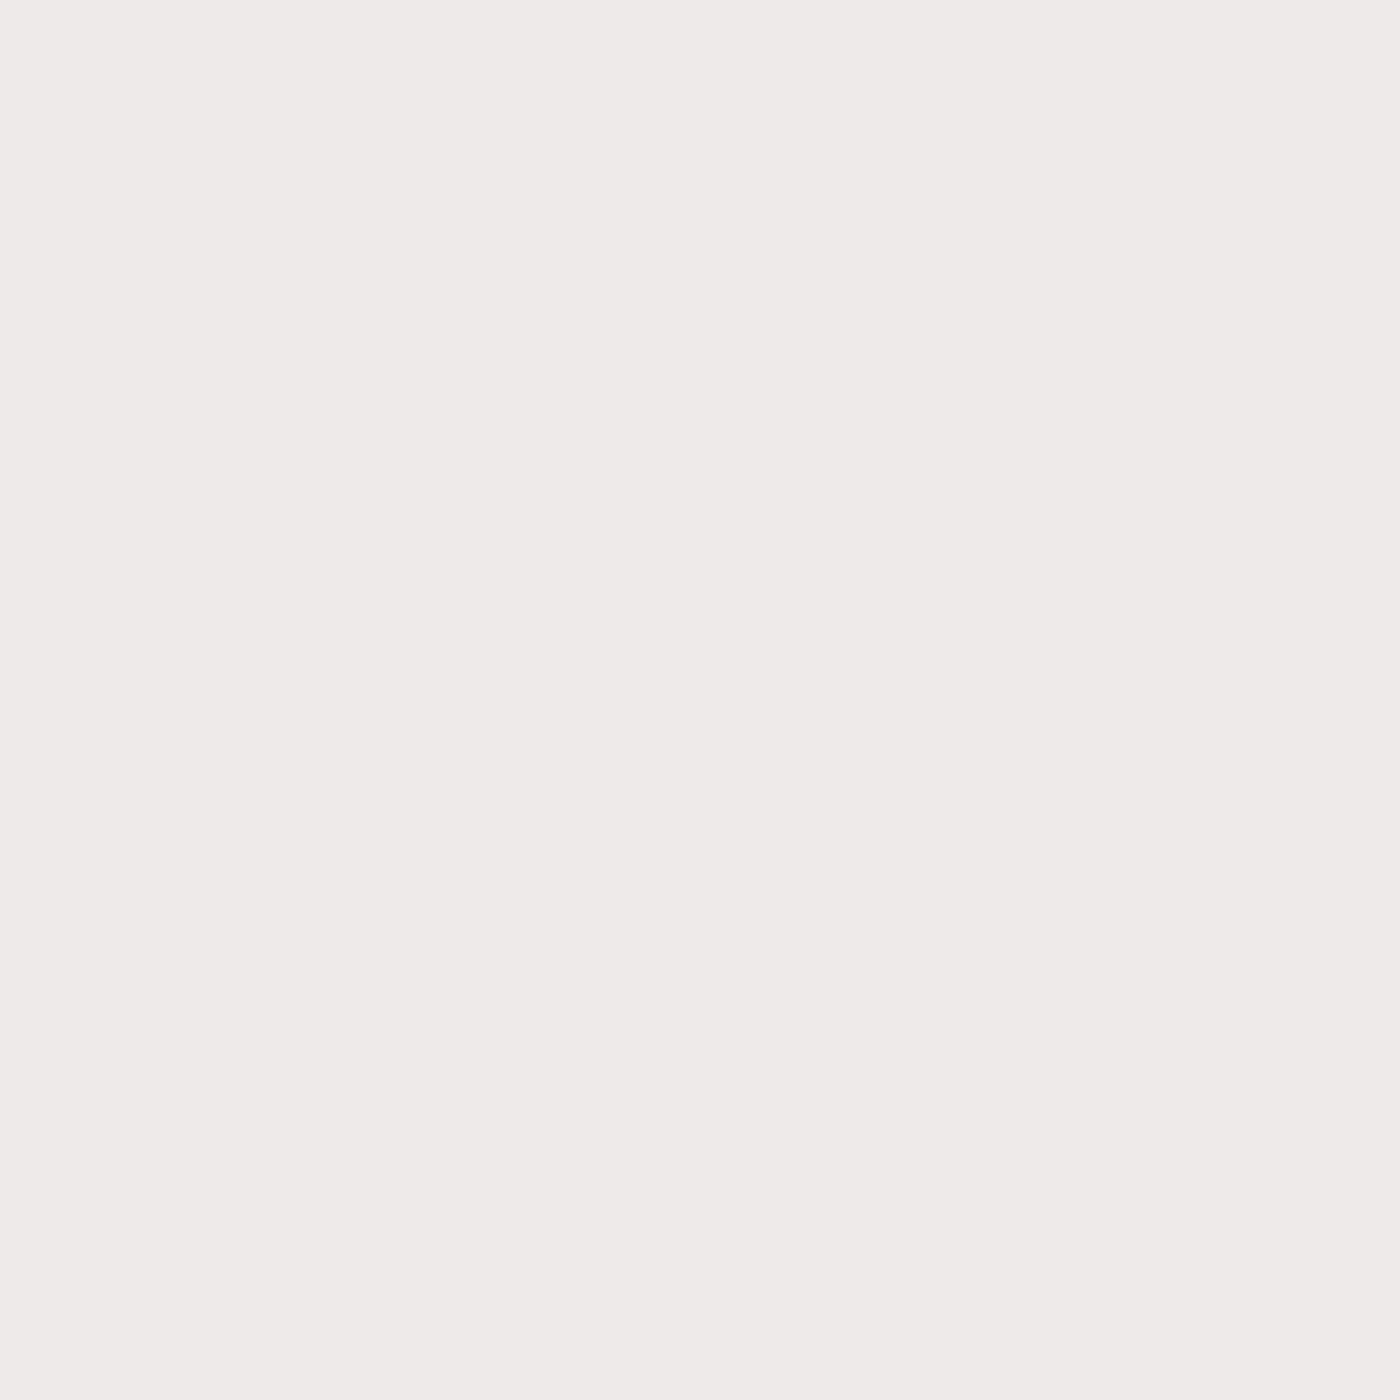 KOMPLEMENT 콤플레멘트 선반, 화이트, 100x58 cm